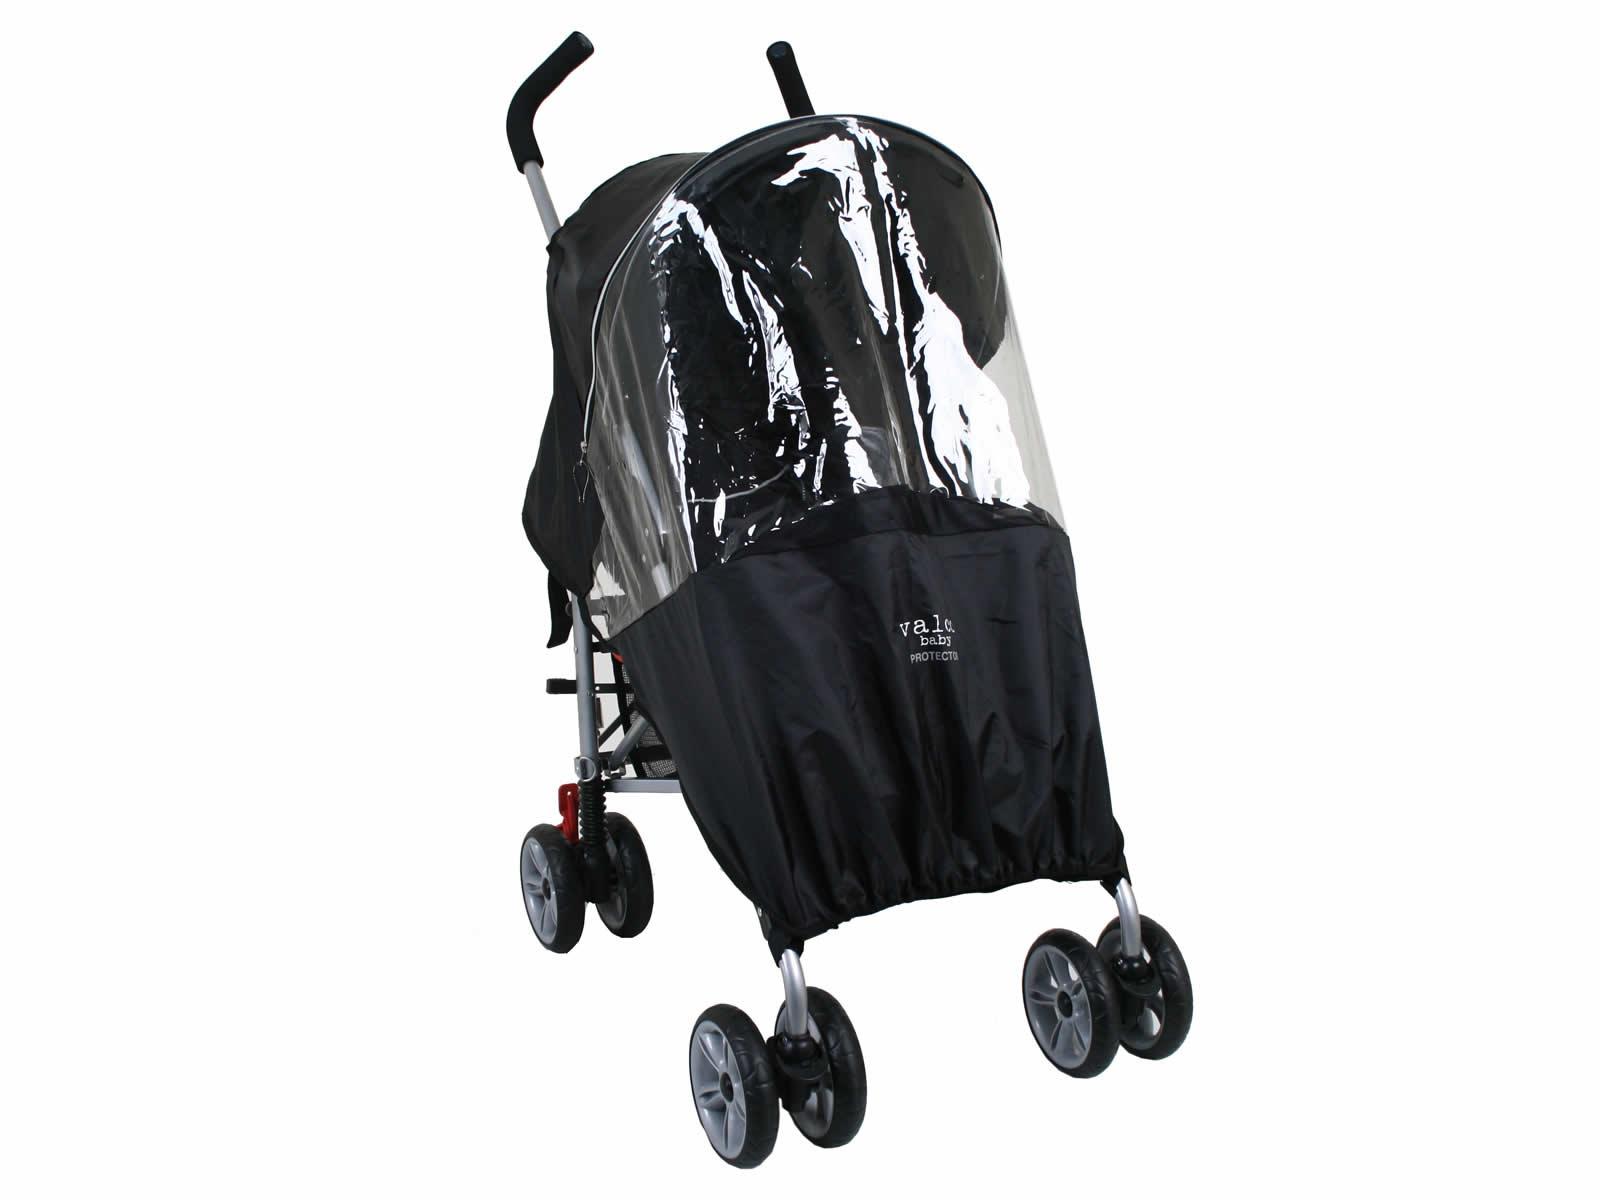 T3 Plus and Umbrella Raincover Protector Deluxe